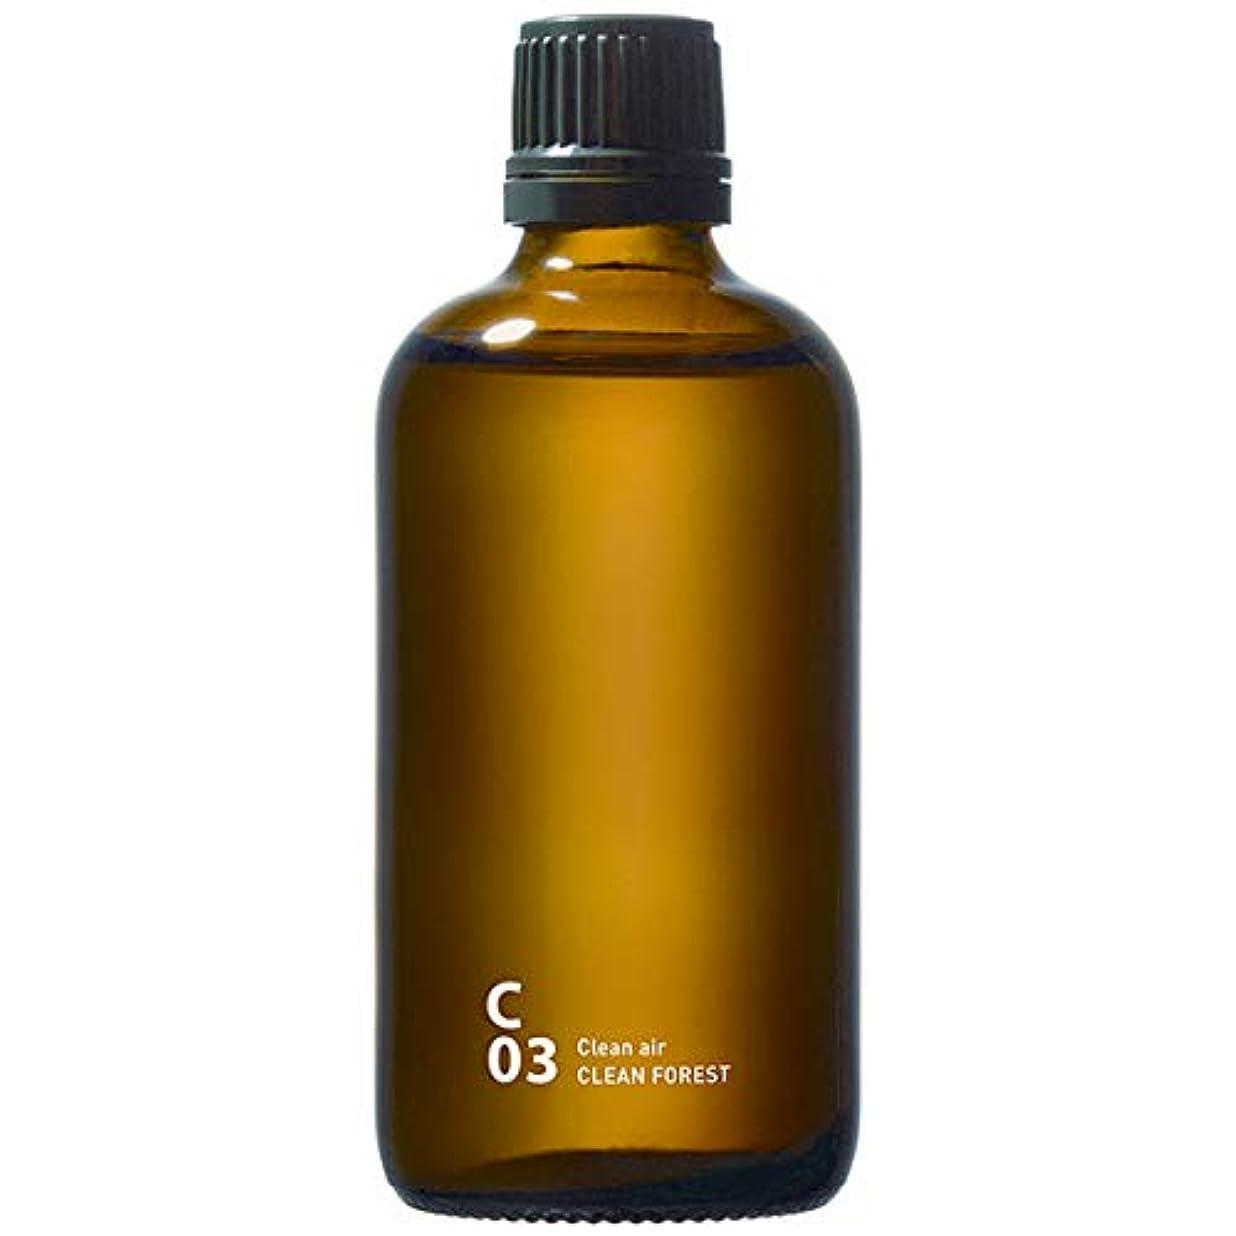 形状侵略道徳C03 CLEAN FOREST piezo aroma oil 100ml